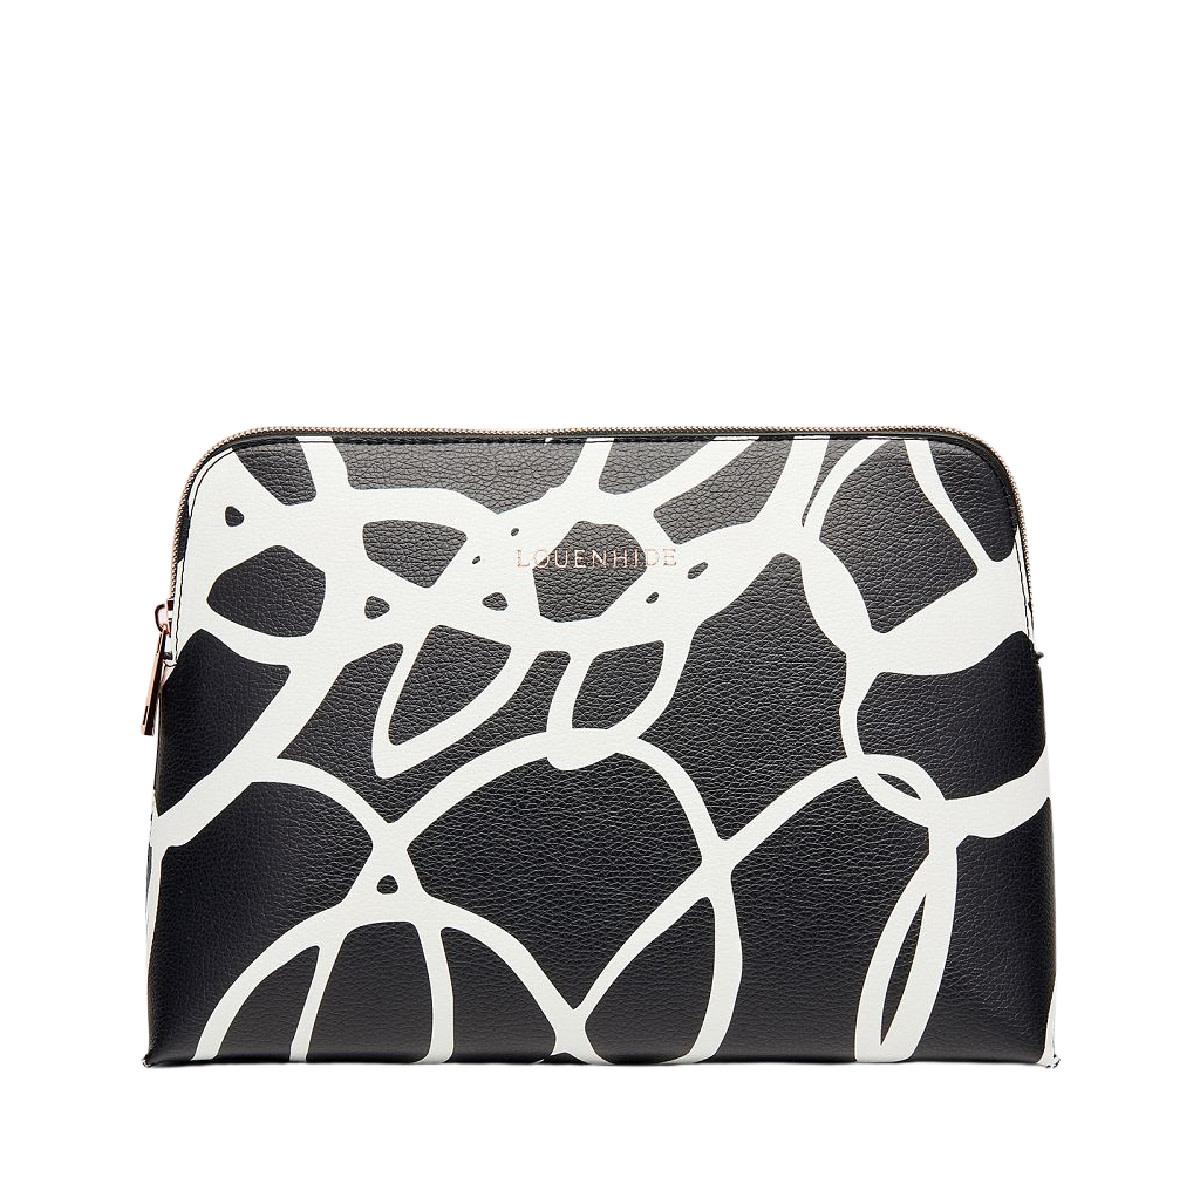 Lounenhide Bardot Cosmetic Bag Black Swirl